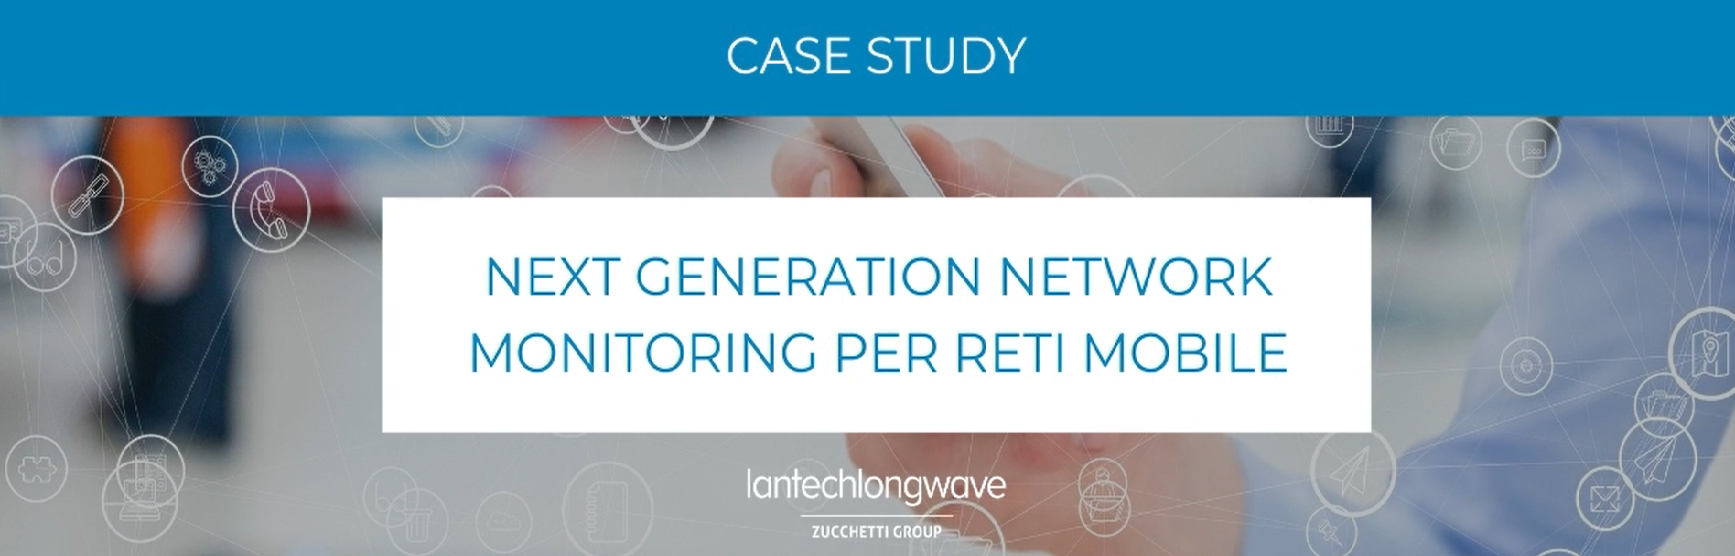 Next generation network monitoring per reti mobile